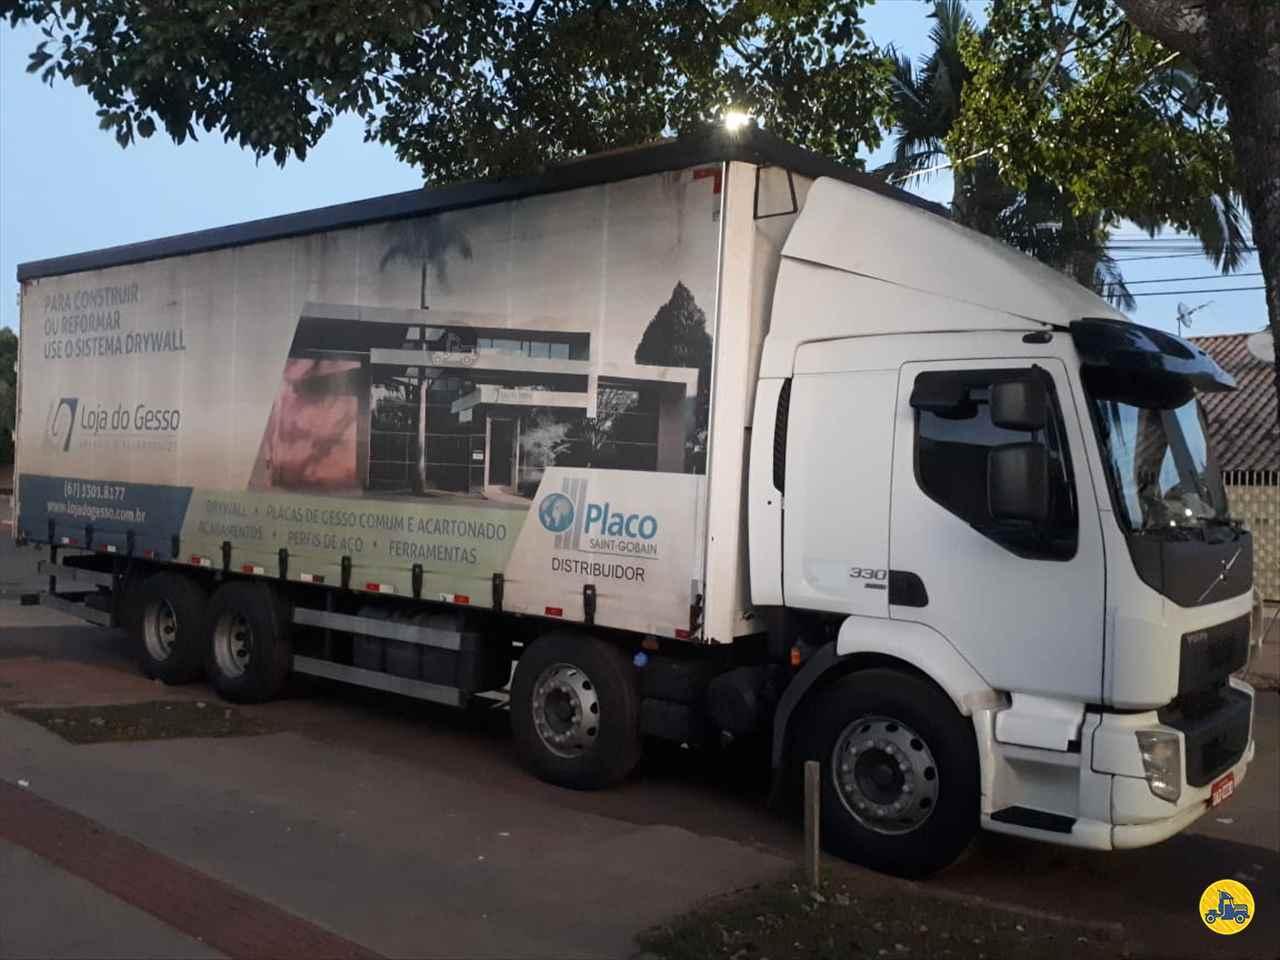 VOLVO VOLVO VM 330 550000km 2015/2015 Megatruck Caminhões e Máquinas